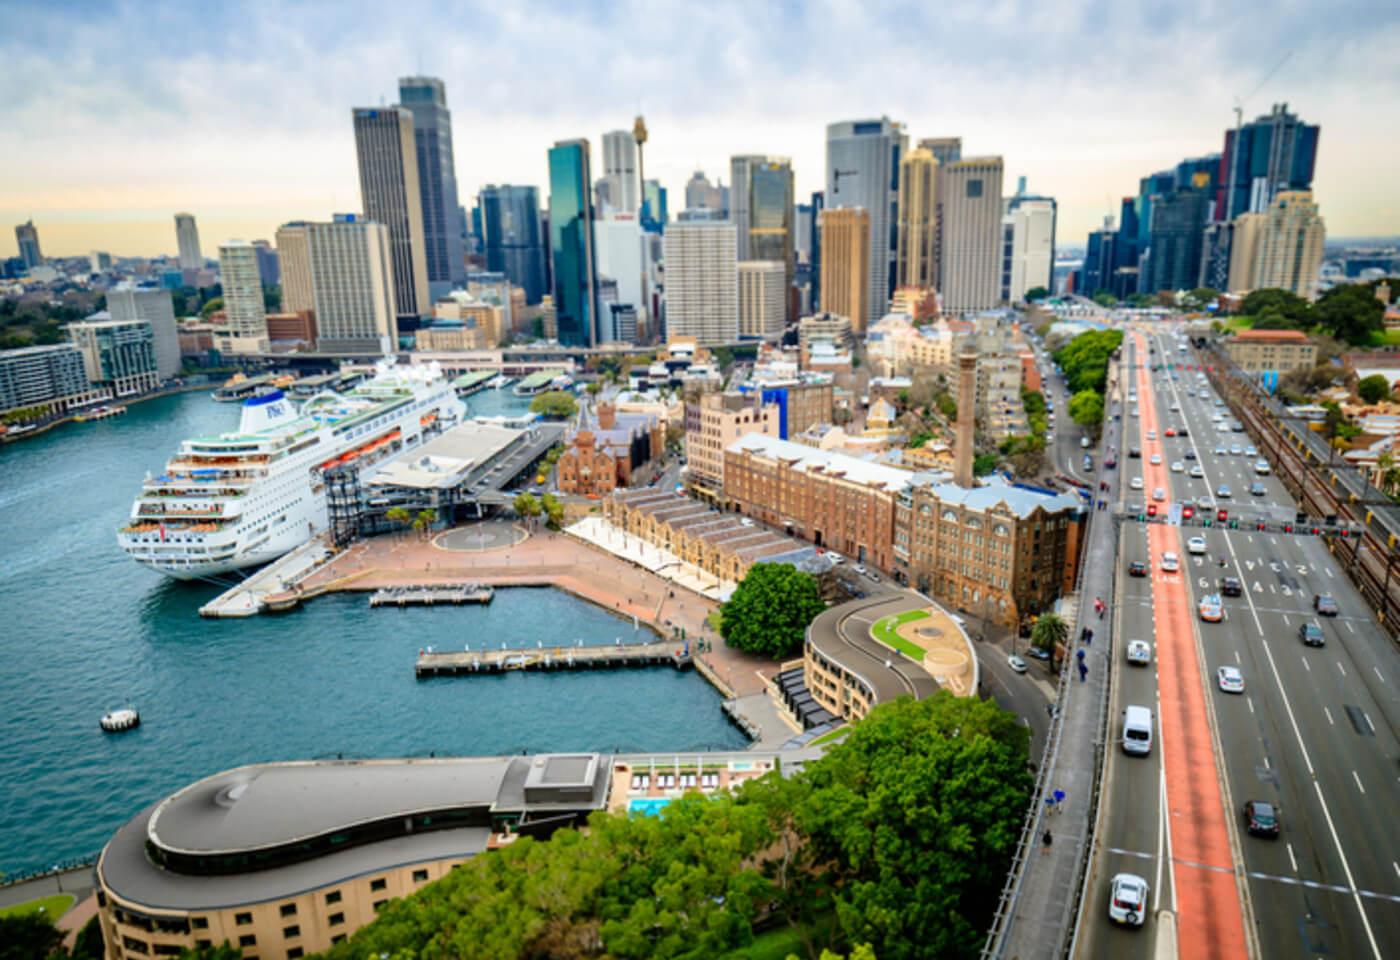 Photograph of Sydney city